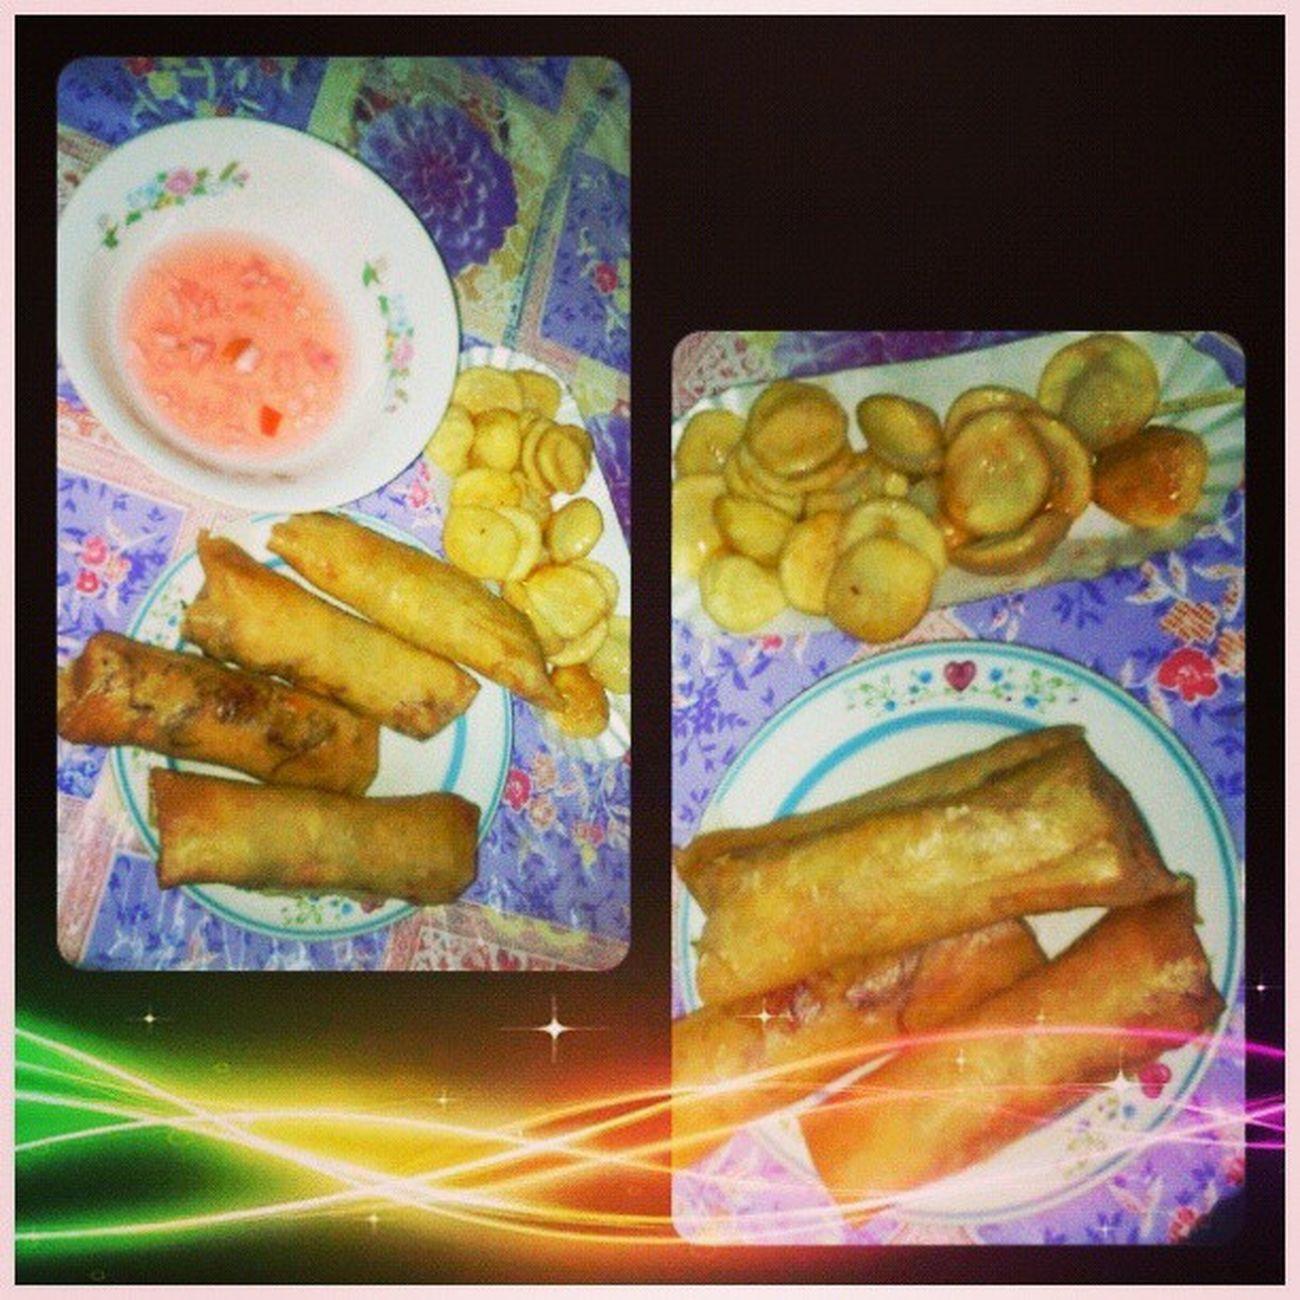 Perfect Meryenda, LumpiangToge and Fishballs PagkaengPinoy Lutongpinoy MeryendaTimes :)